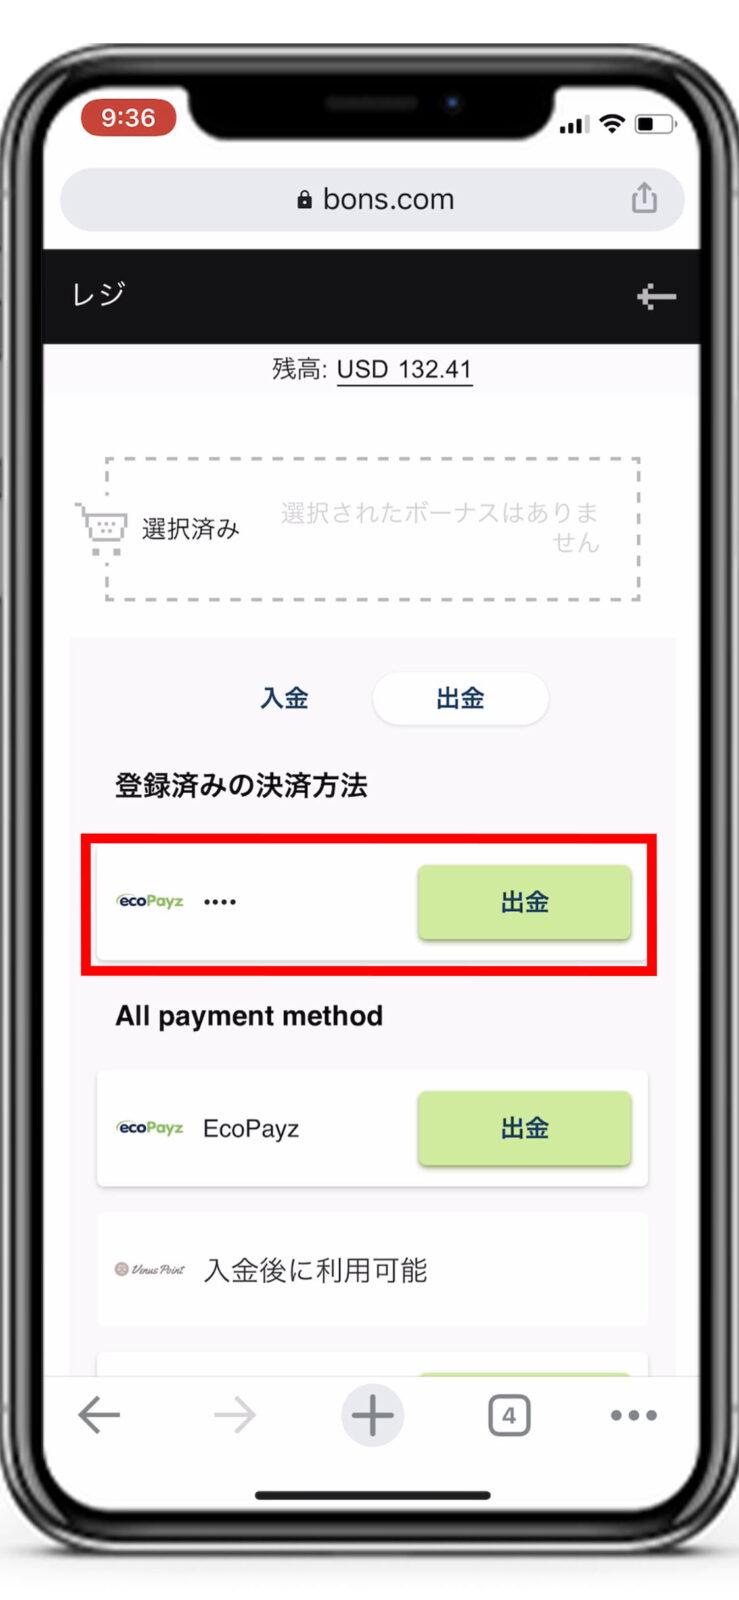 bonscasino_payment19